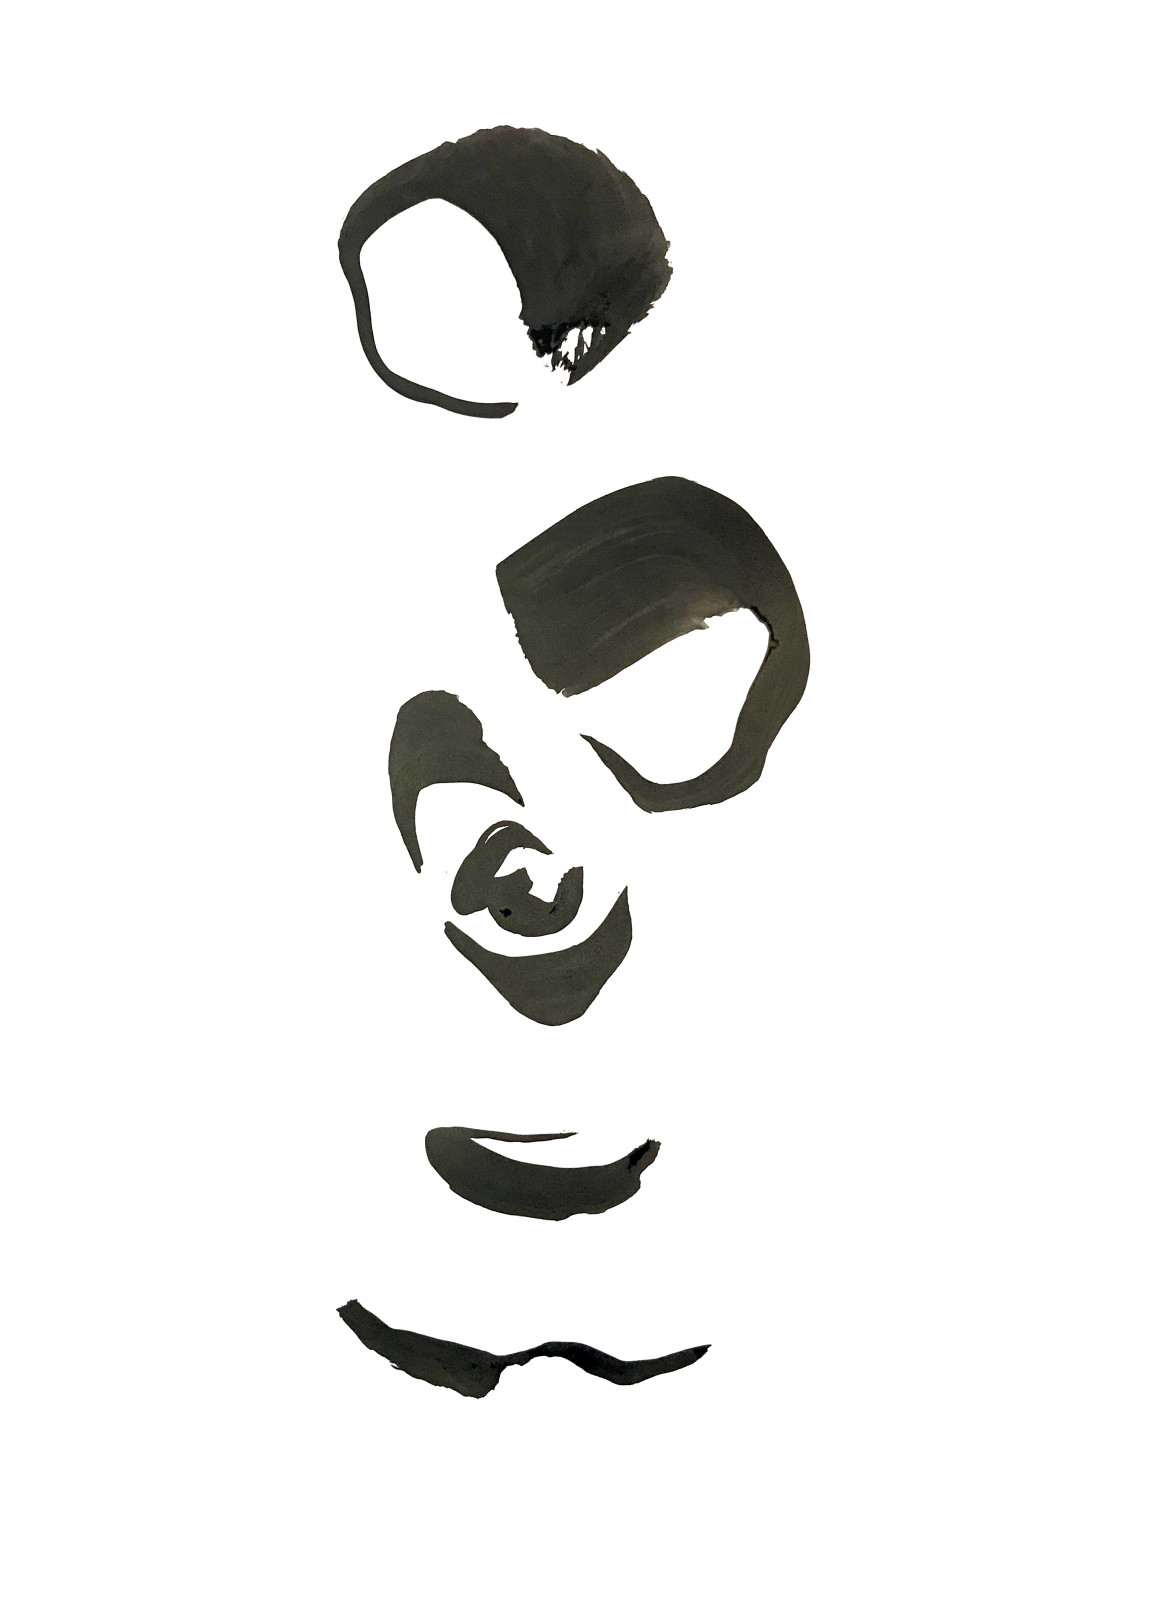 Panda Portrait in characters